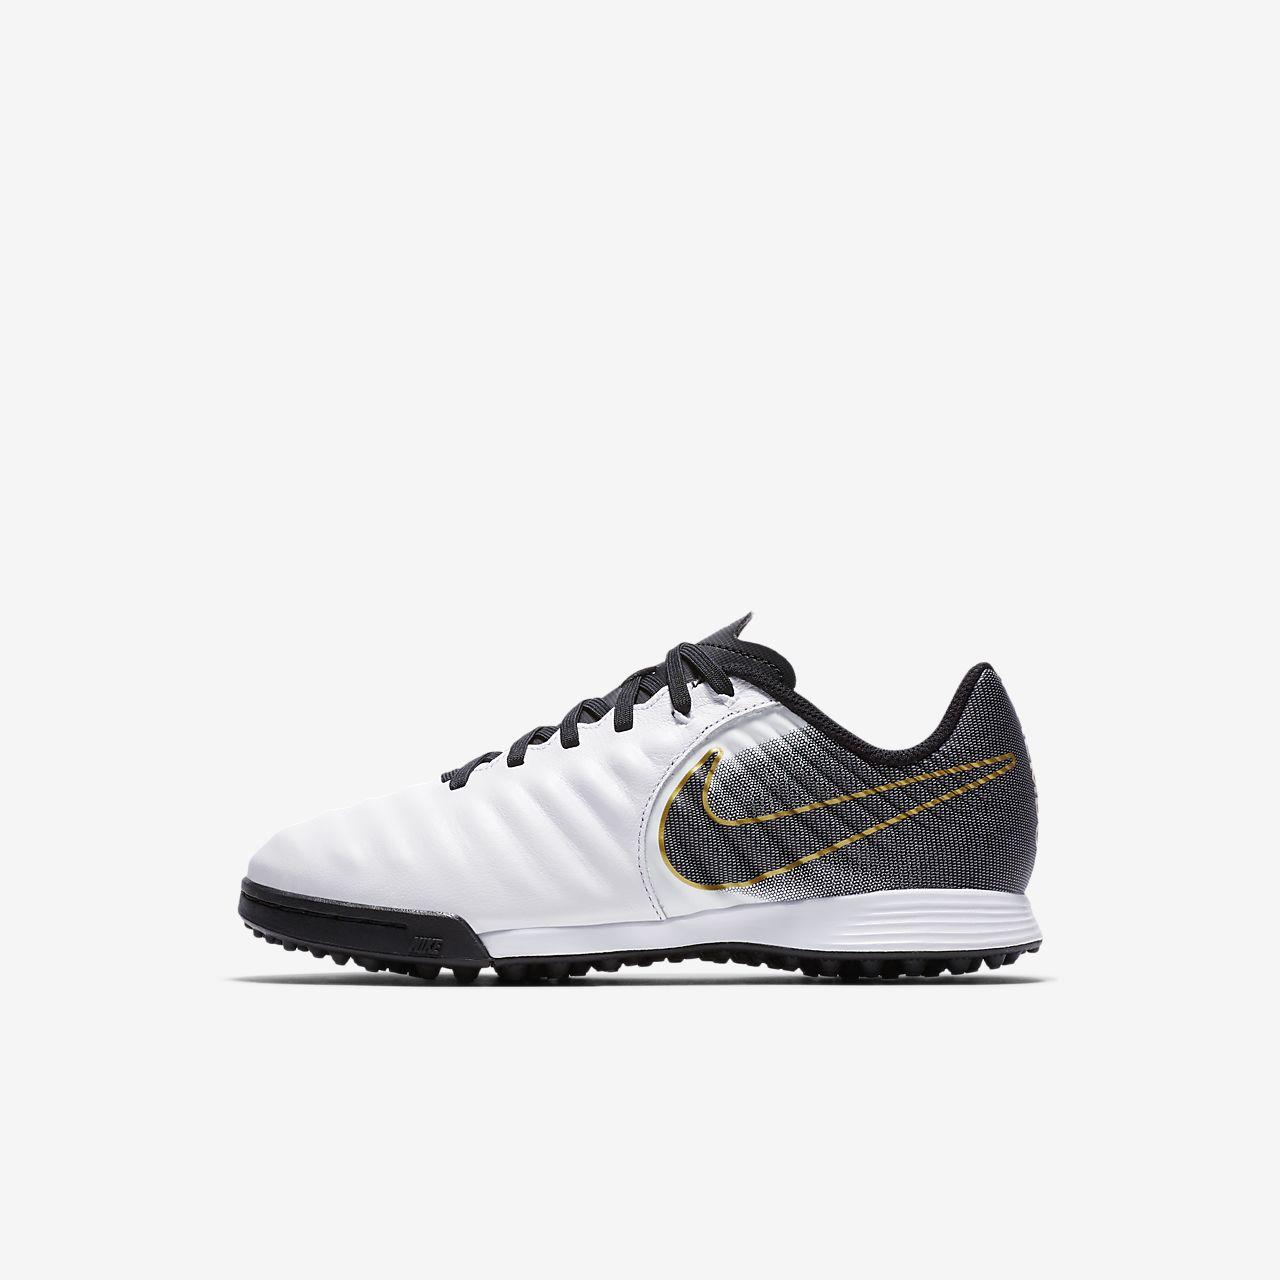 ... Calzado de fútbol de césped artificial para niños de talla  pequeña grande Nike Jr. 2ea3134627a3b